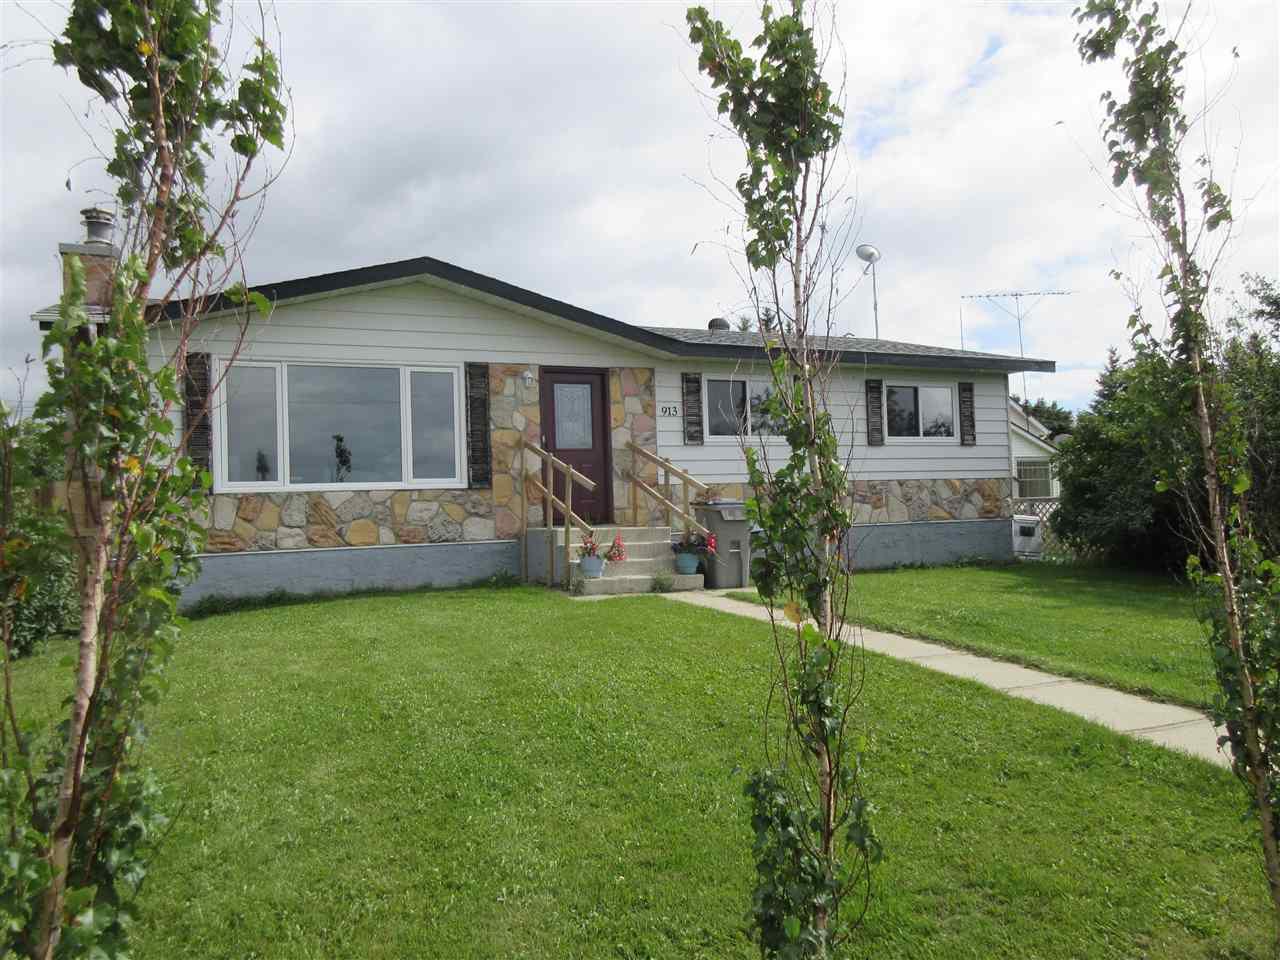 Main Photo: 913 2 Street: Thorhild House for sale : MLS®# E4127827